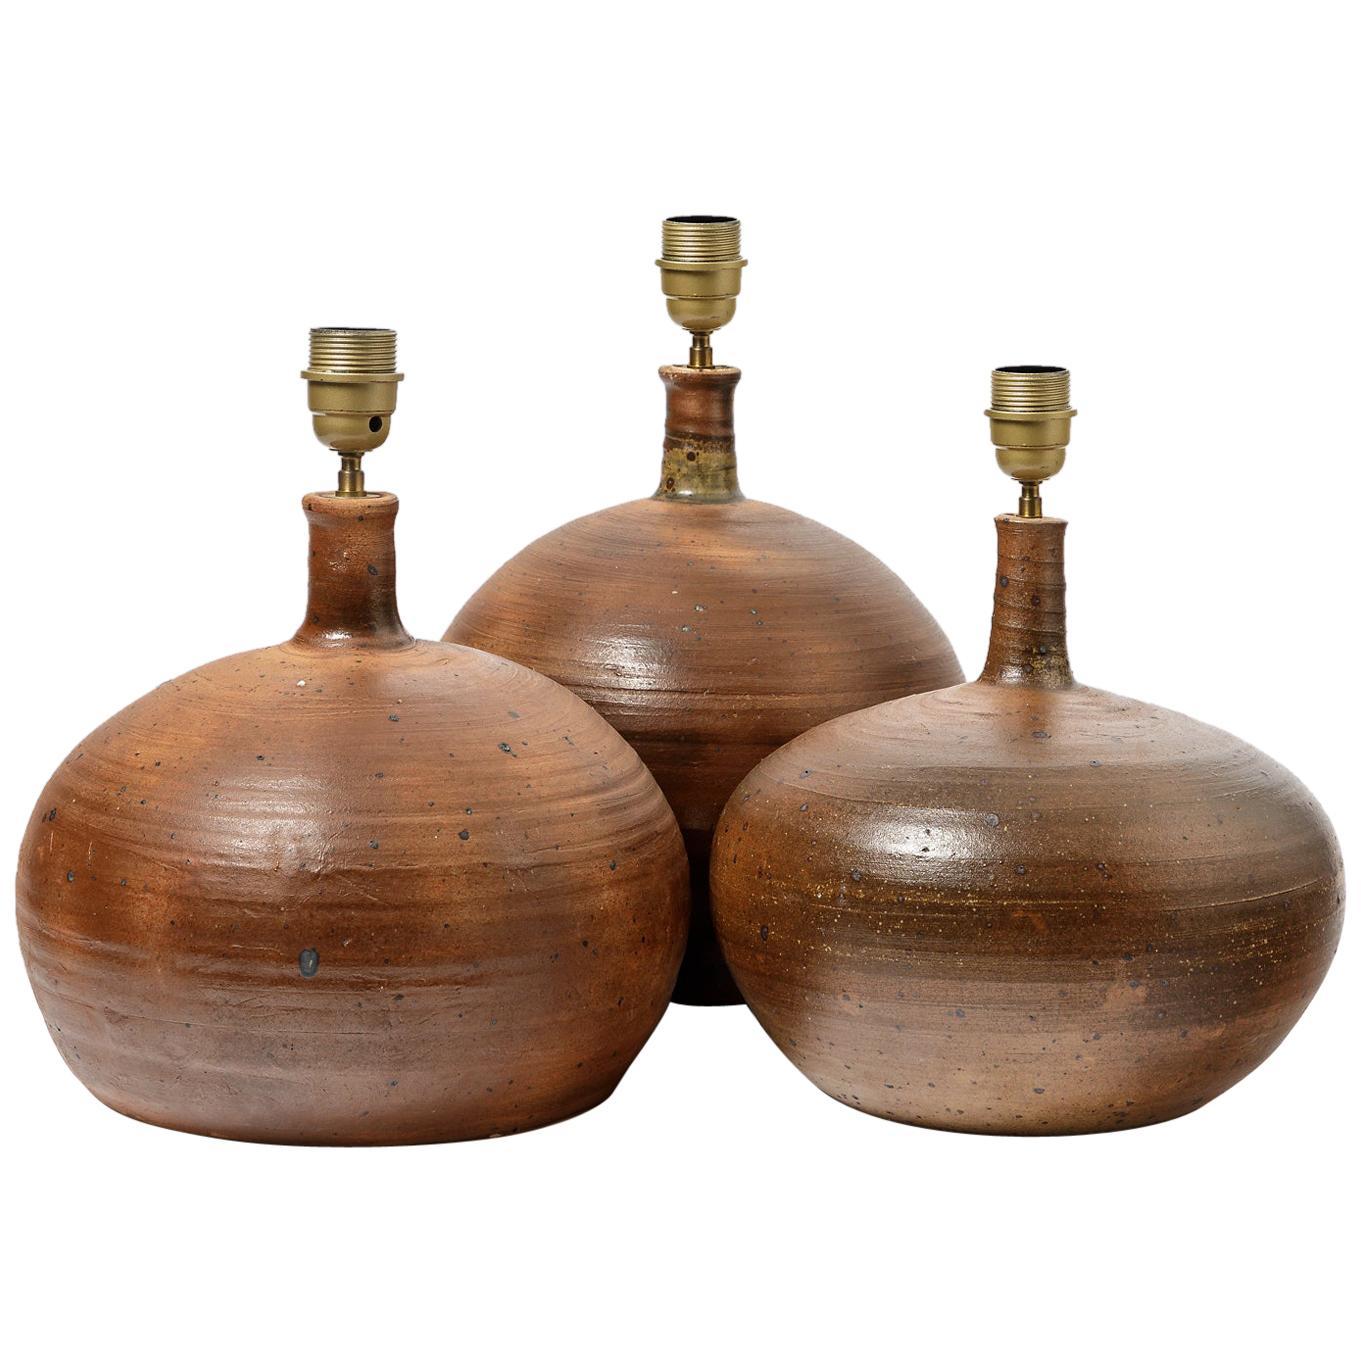 Set of Three Stoneware Table Lamps by Pierre Digan to La Borne, circa 1970